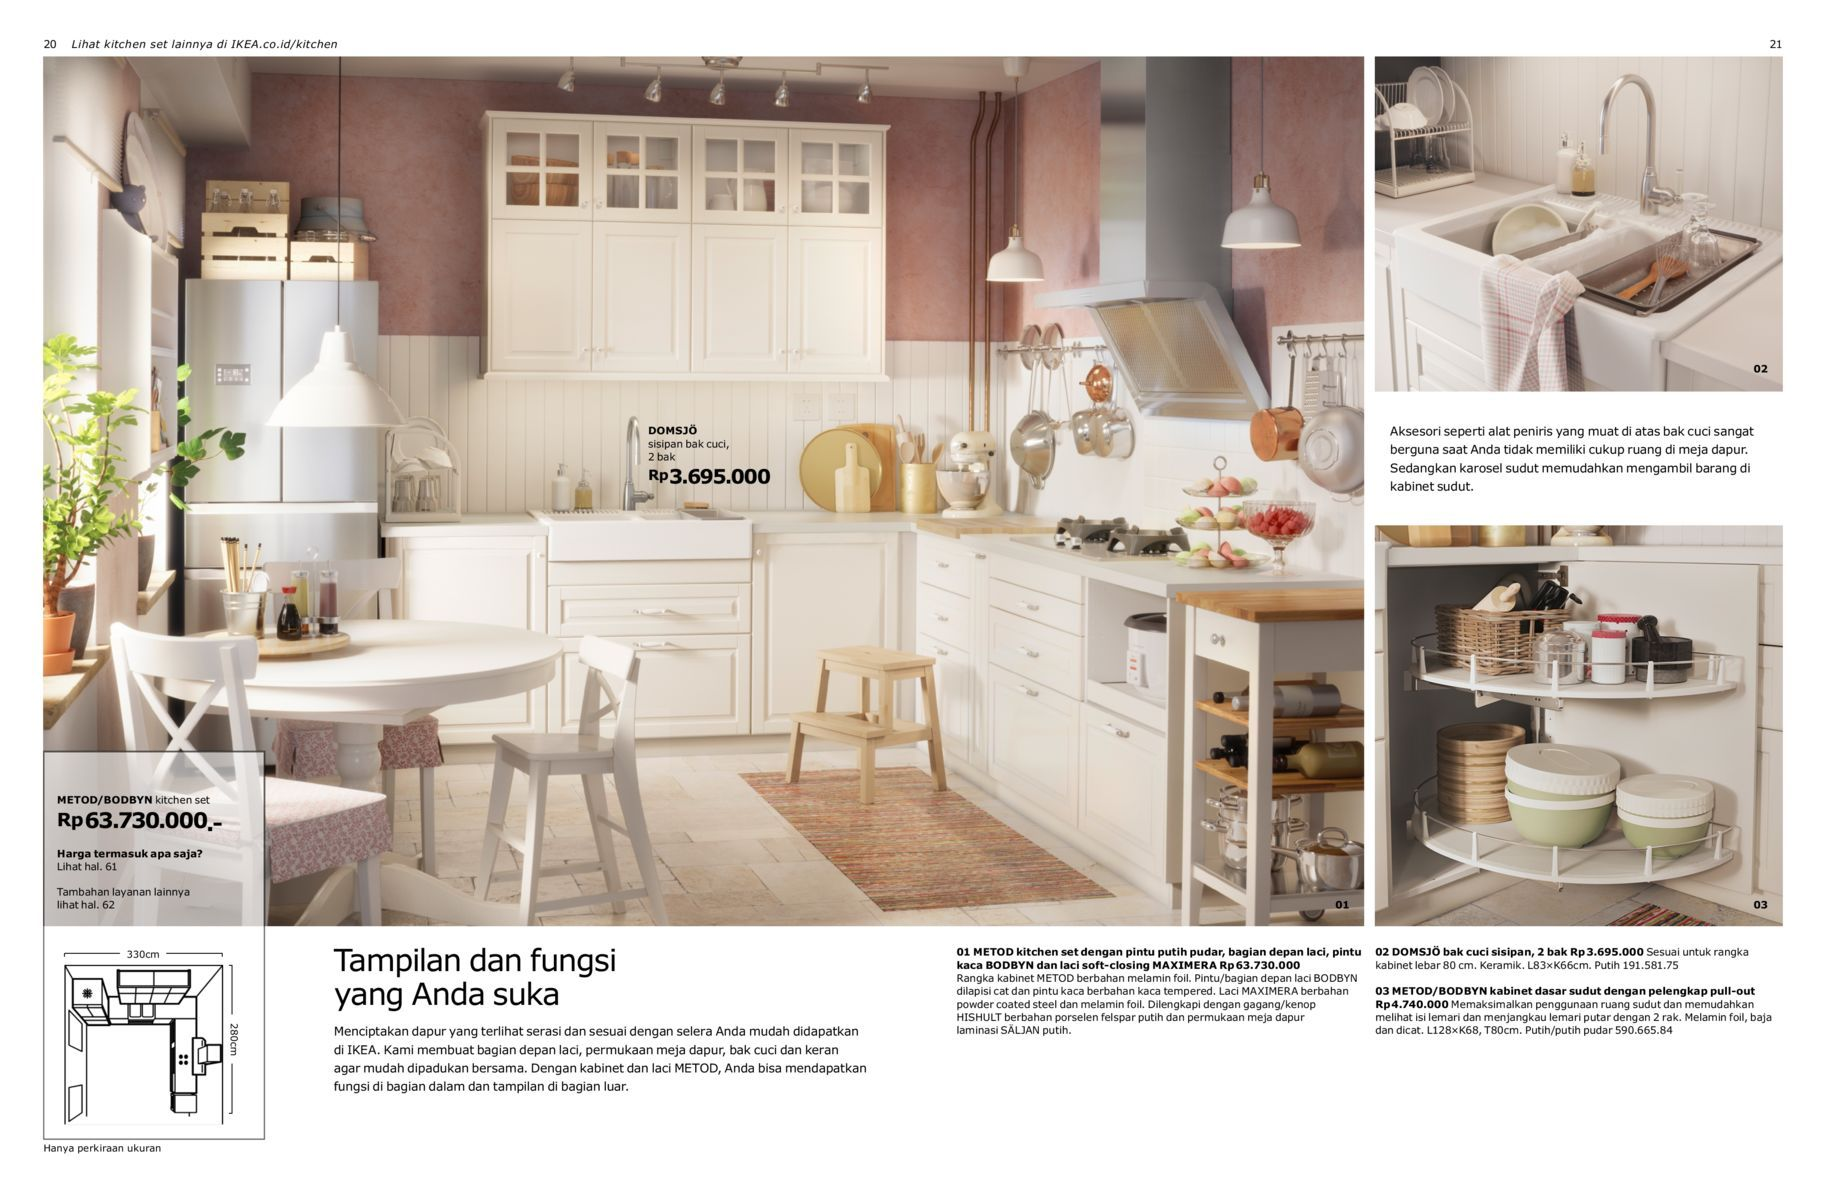 Brosur Dapur Metod 2017 | my idea for kitchen set | Pinterest ...